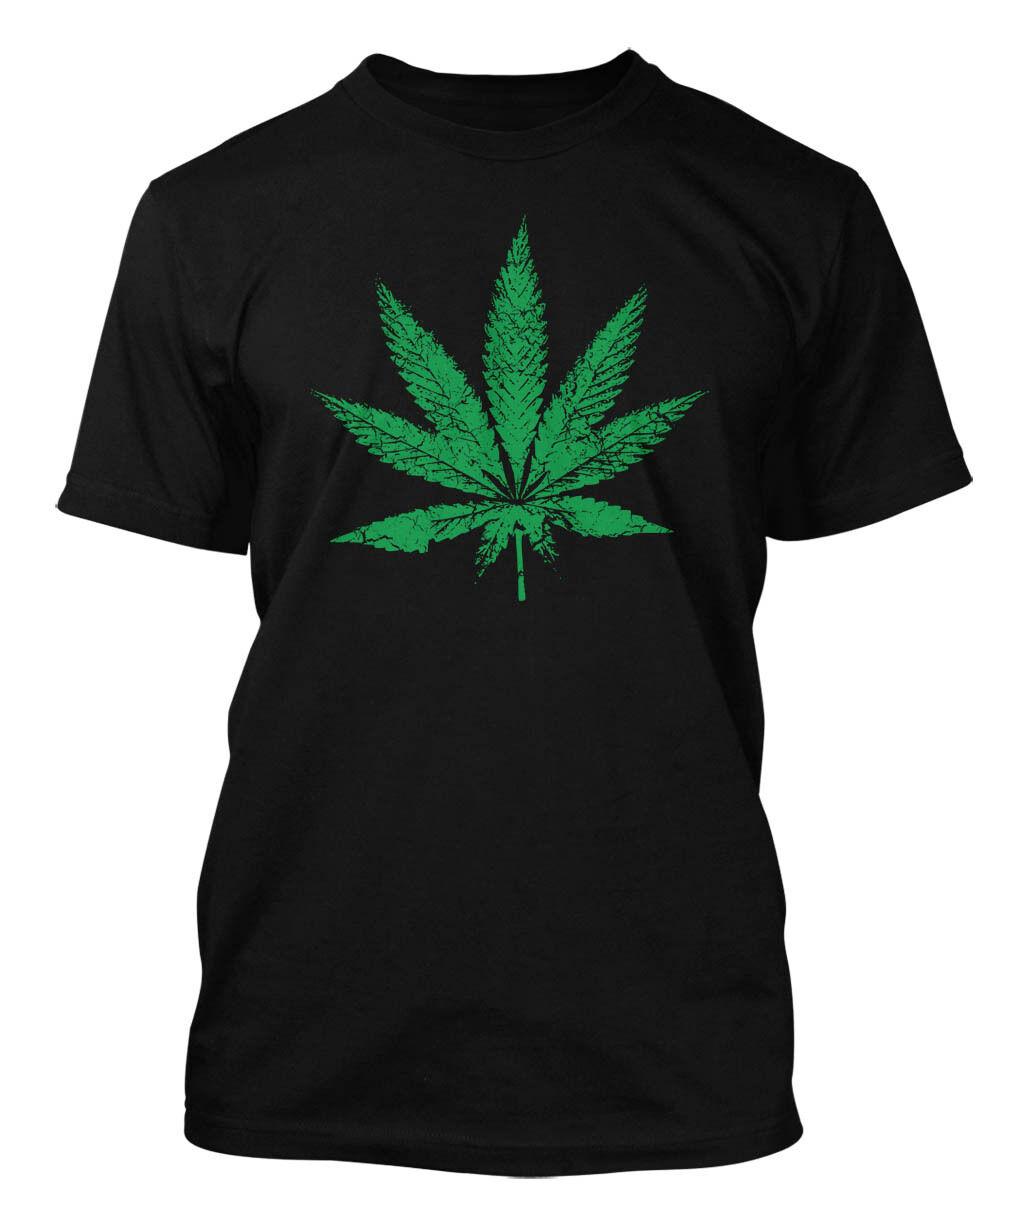 Distressed Marijuana Leaf - Weed Pot Stoner Men's T-shirt 1